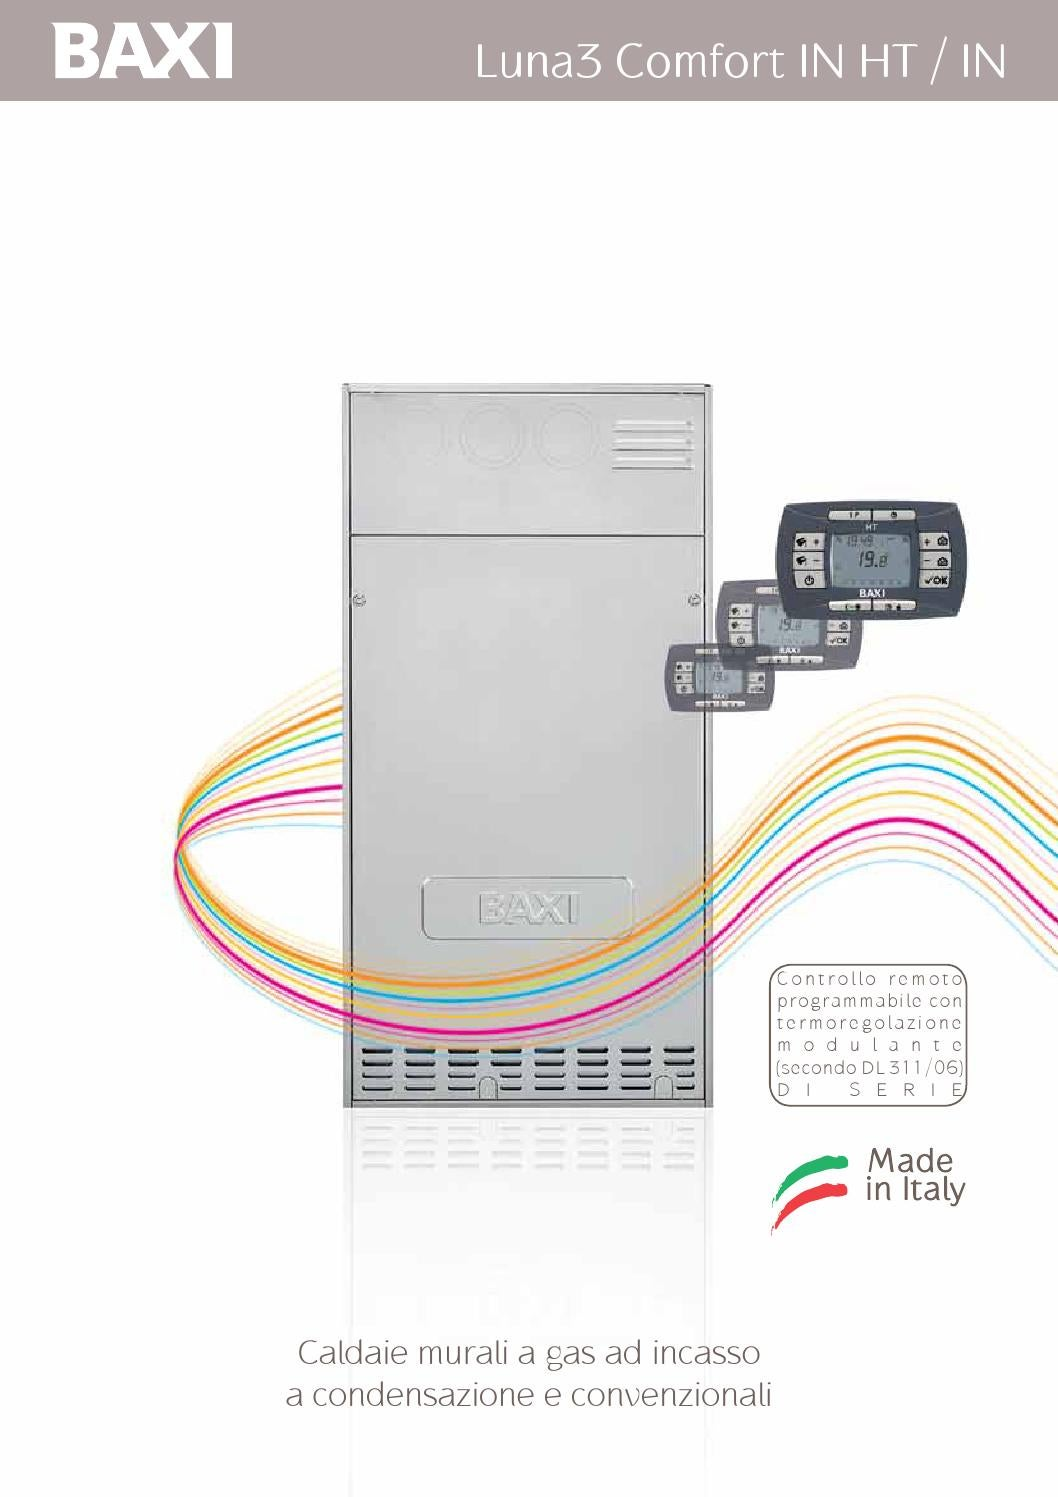 honeywell fcu thermostat wiring diagram polaris sportsman 500 transmission nest technical